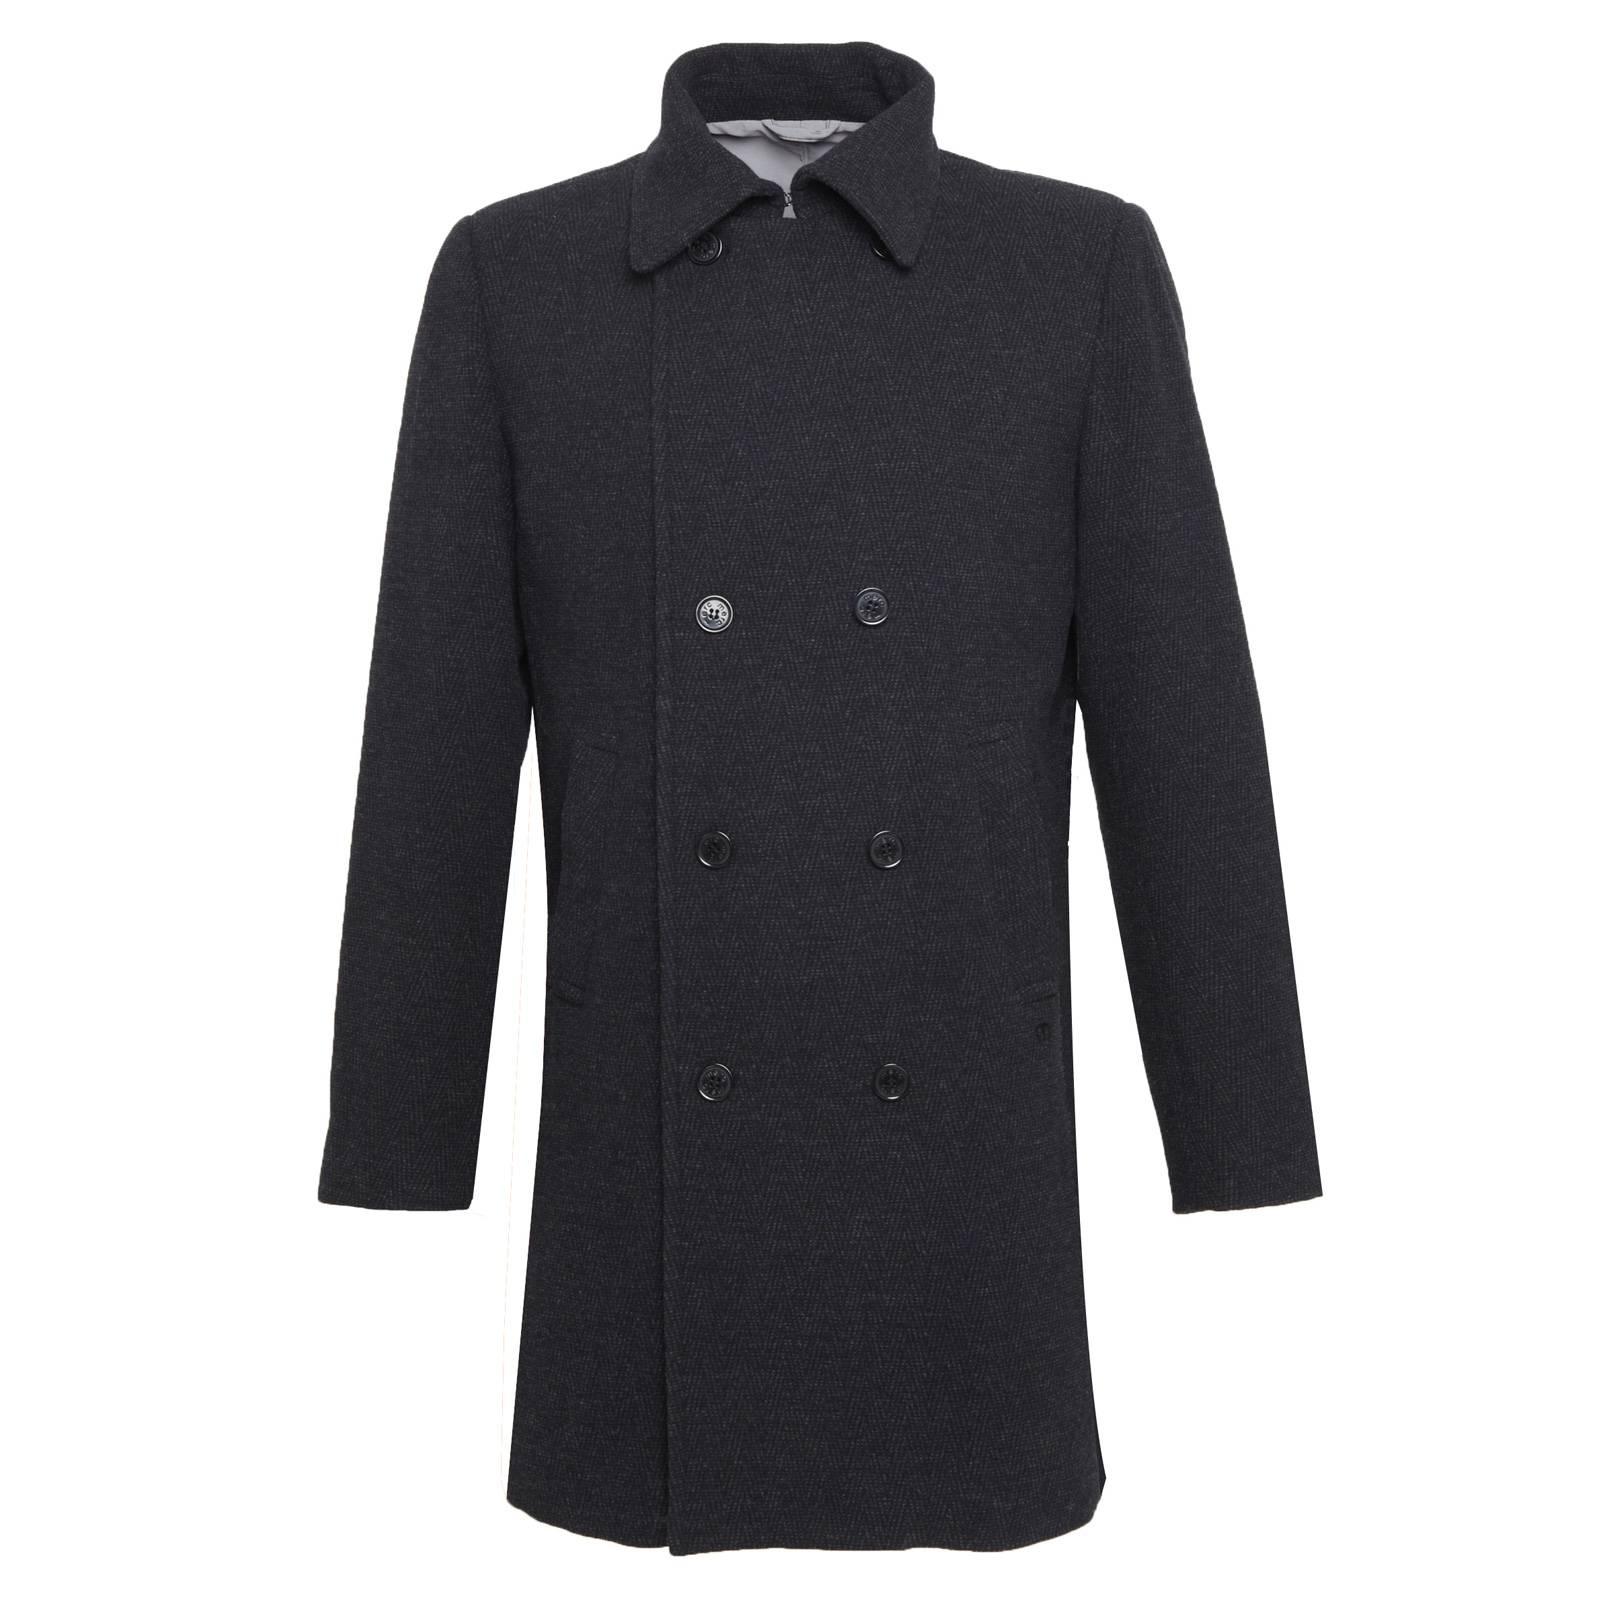 Пальто DalhamКуртки под заказ<br><br><br>Артикул: 1111208<br>Материал: 80% шерсть, 20% полиамид<br>Цвет: темно-серый<br>Пол: Мужской